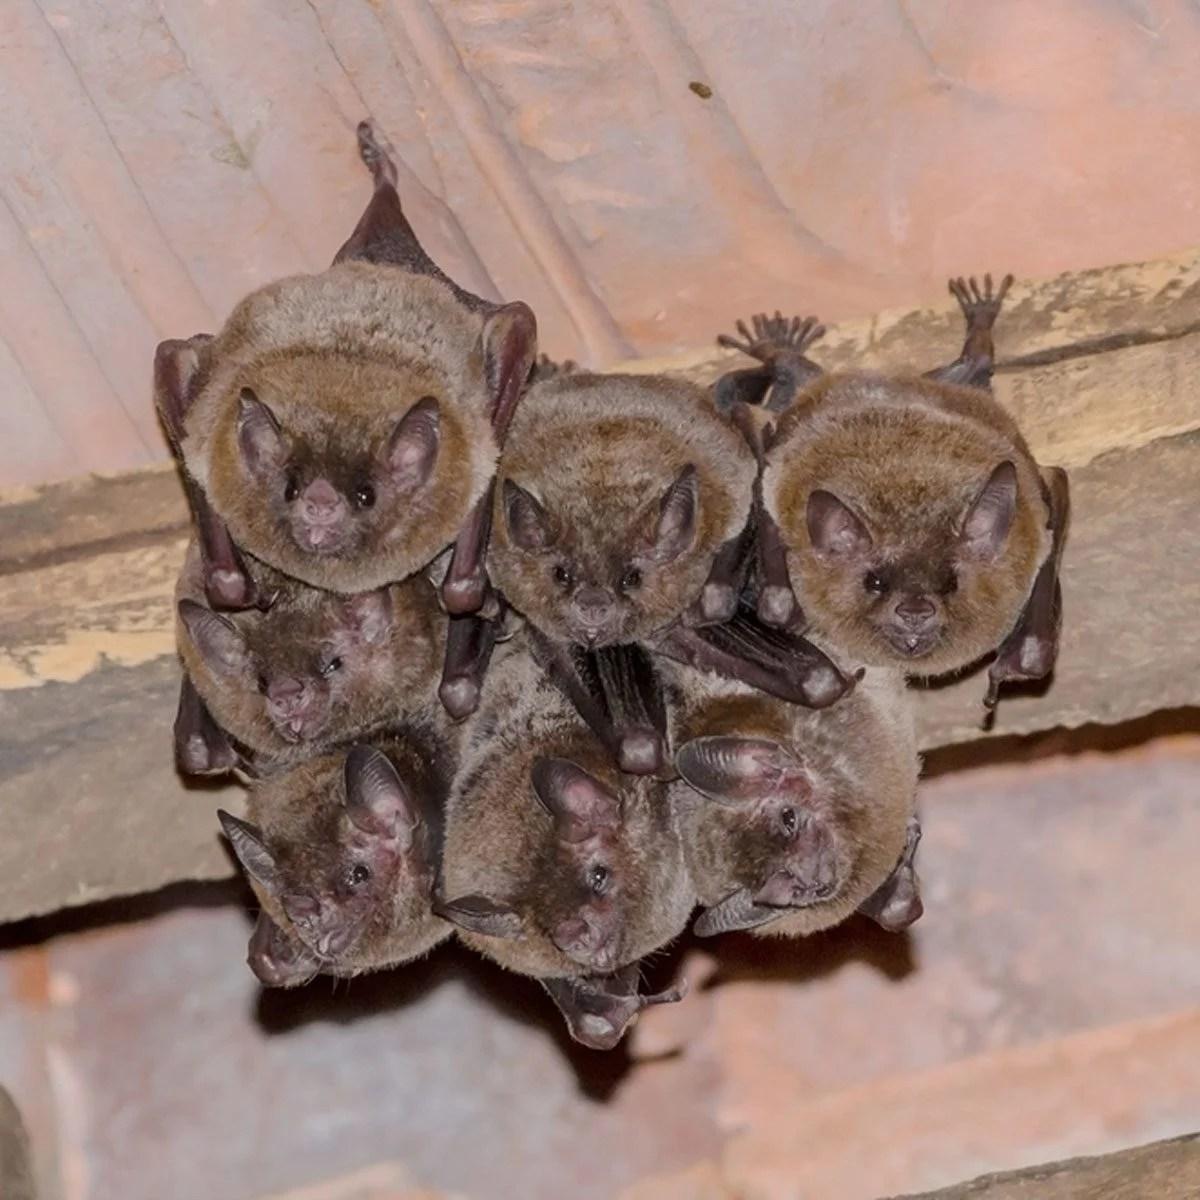 How To Prevent A Bat Problem The Family Handyman